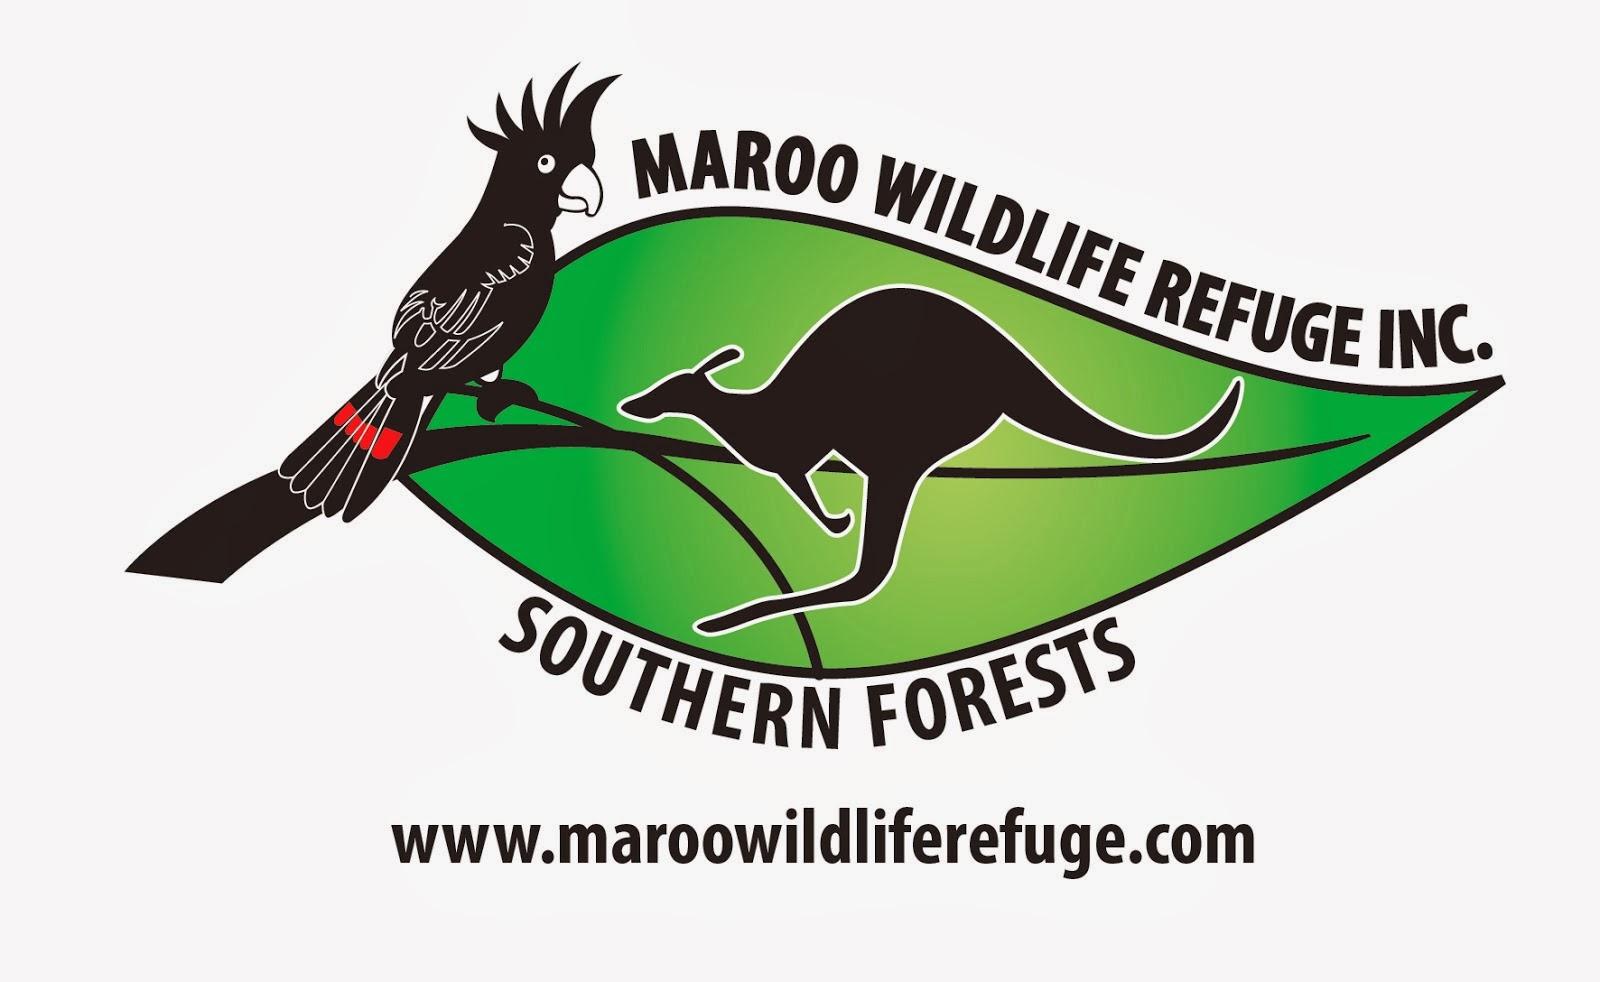 Maroo Wildlife Refuge Inc